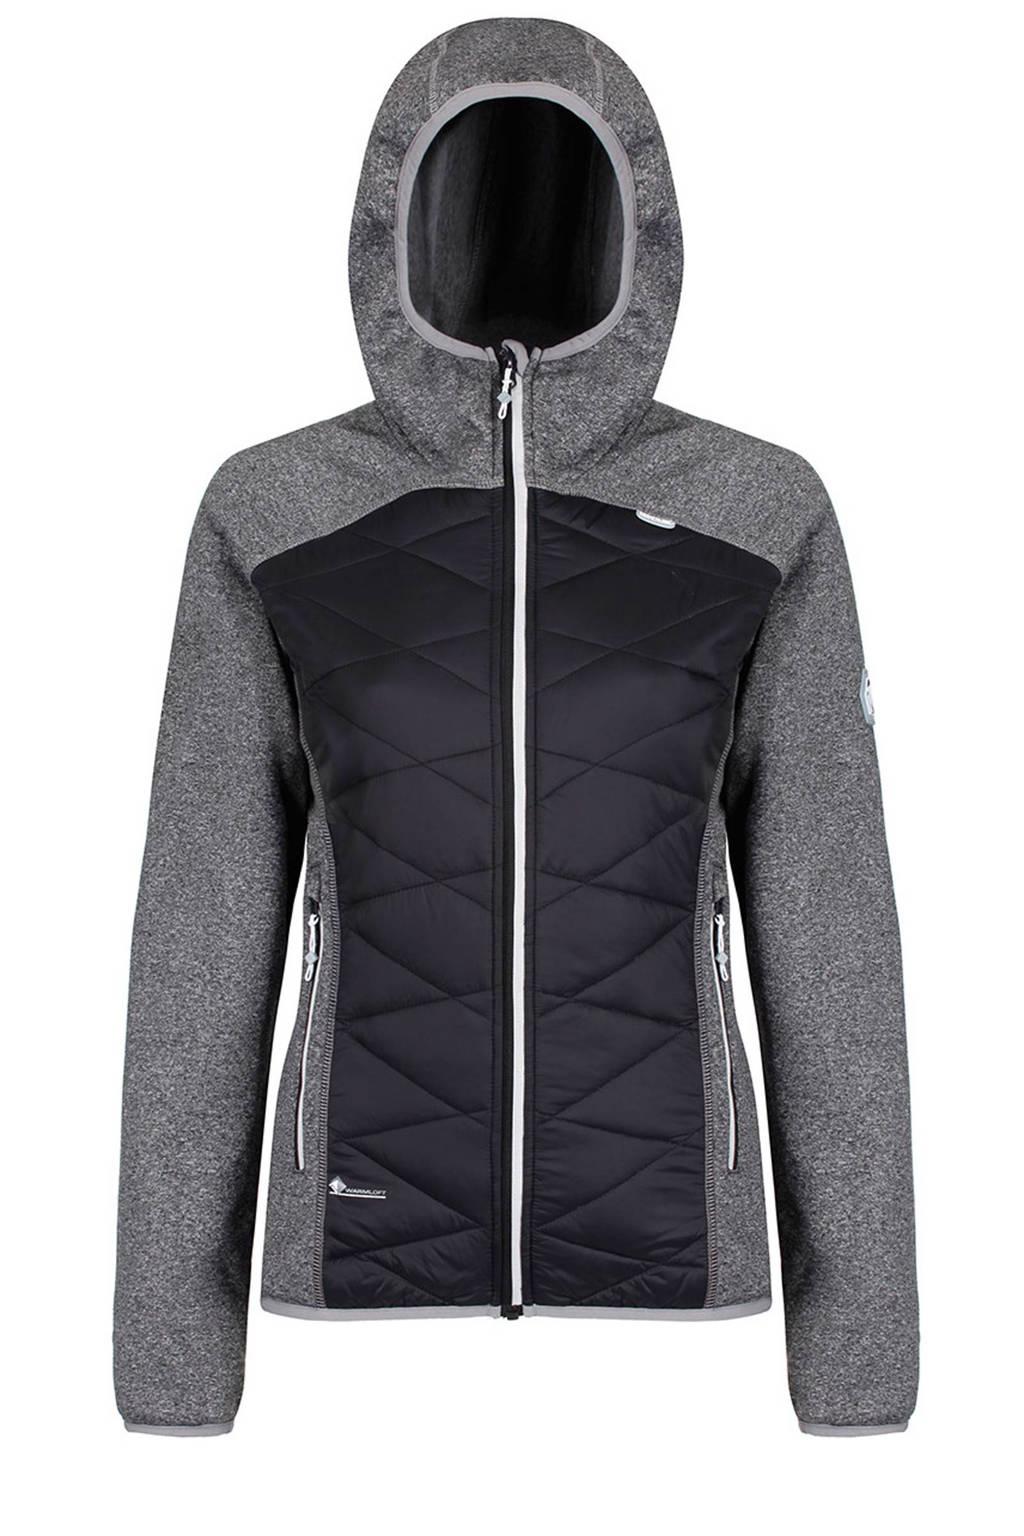 Regatta Andreson midlayer outdoor jas, Grijs melange/zwart